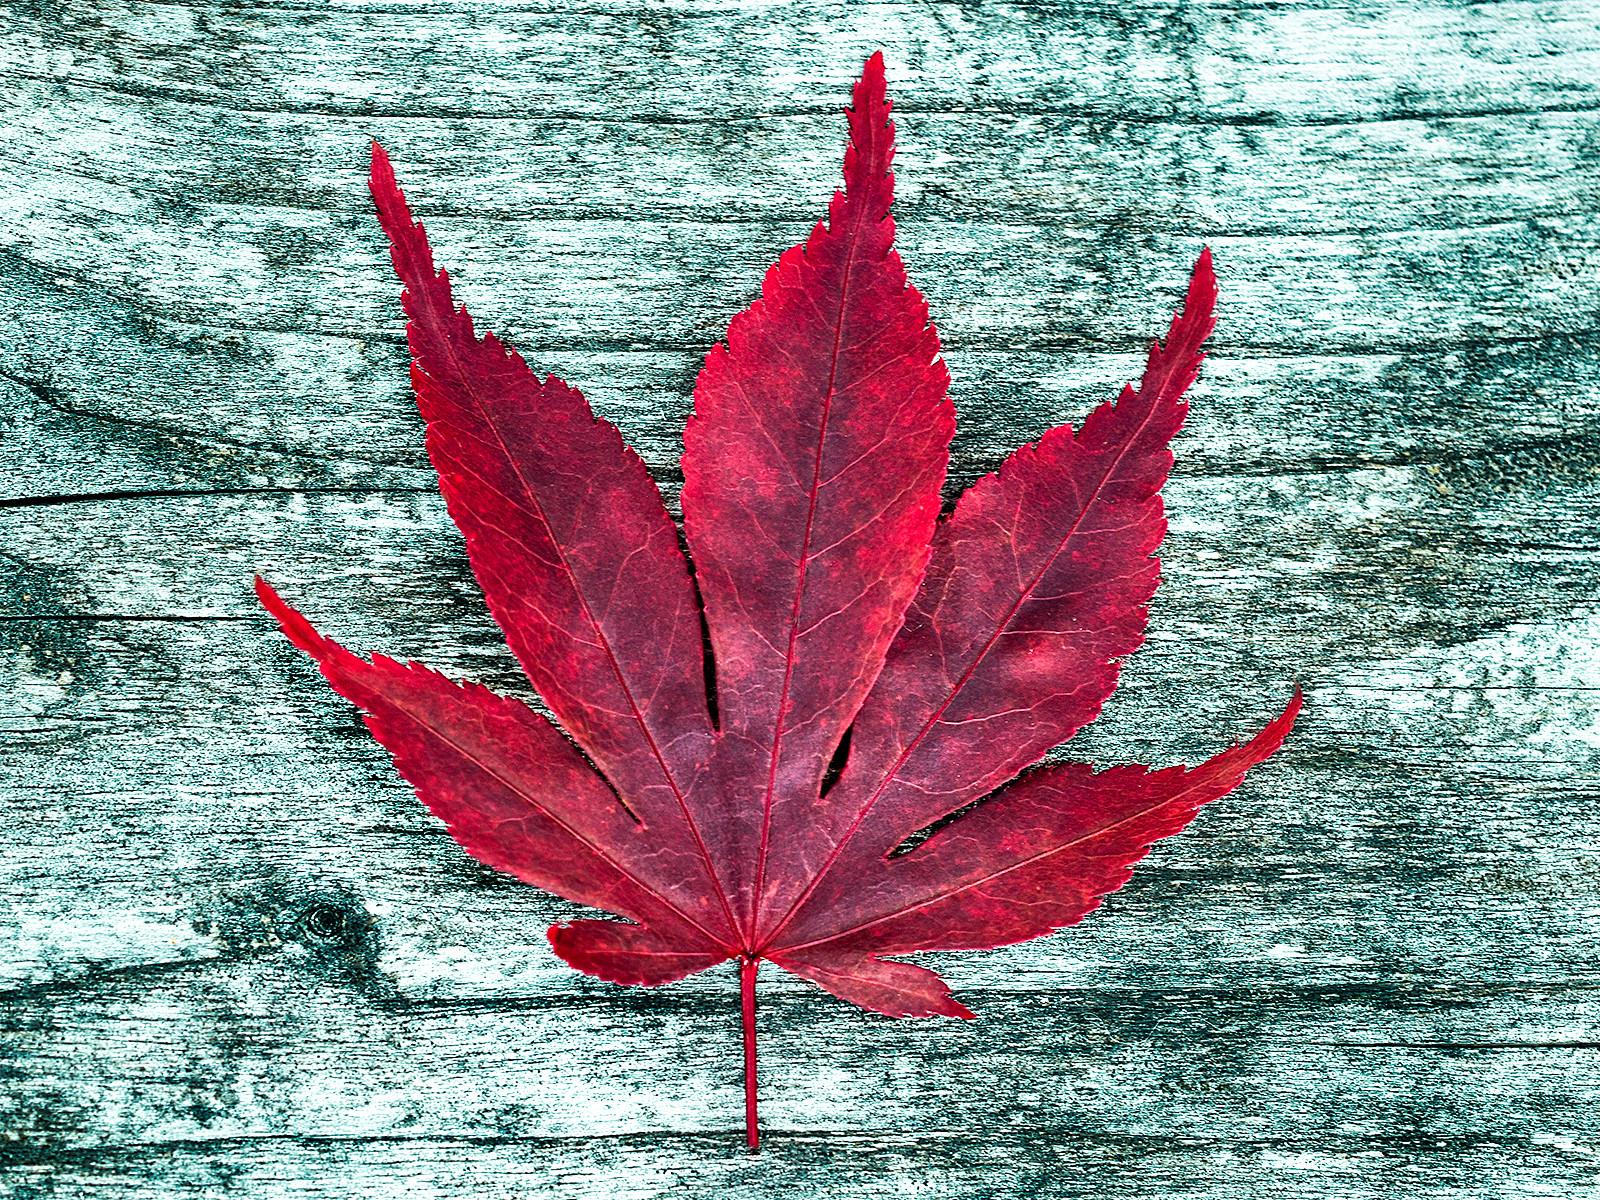 PDI - Maple Leaf by Sharon Gilroy (9 marks)